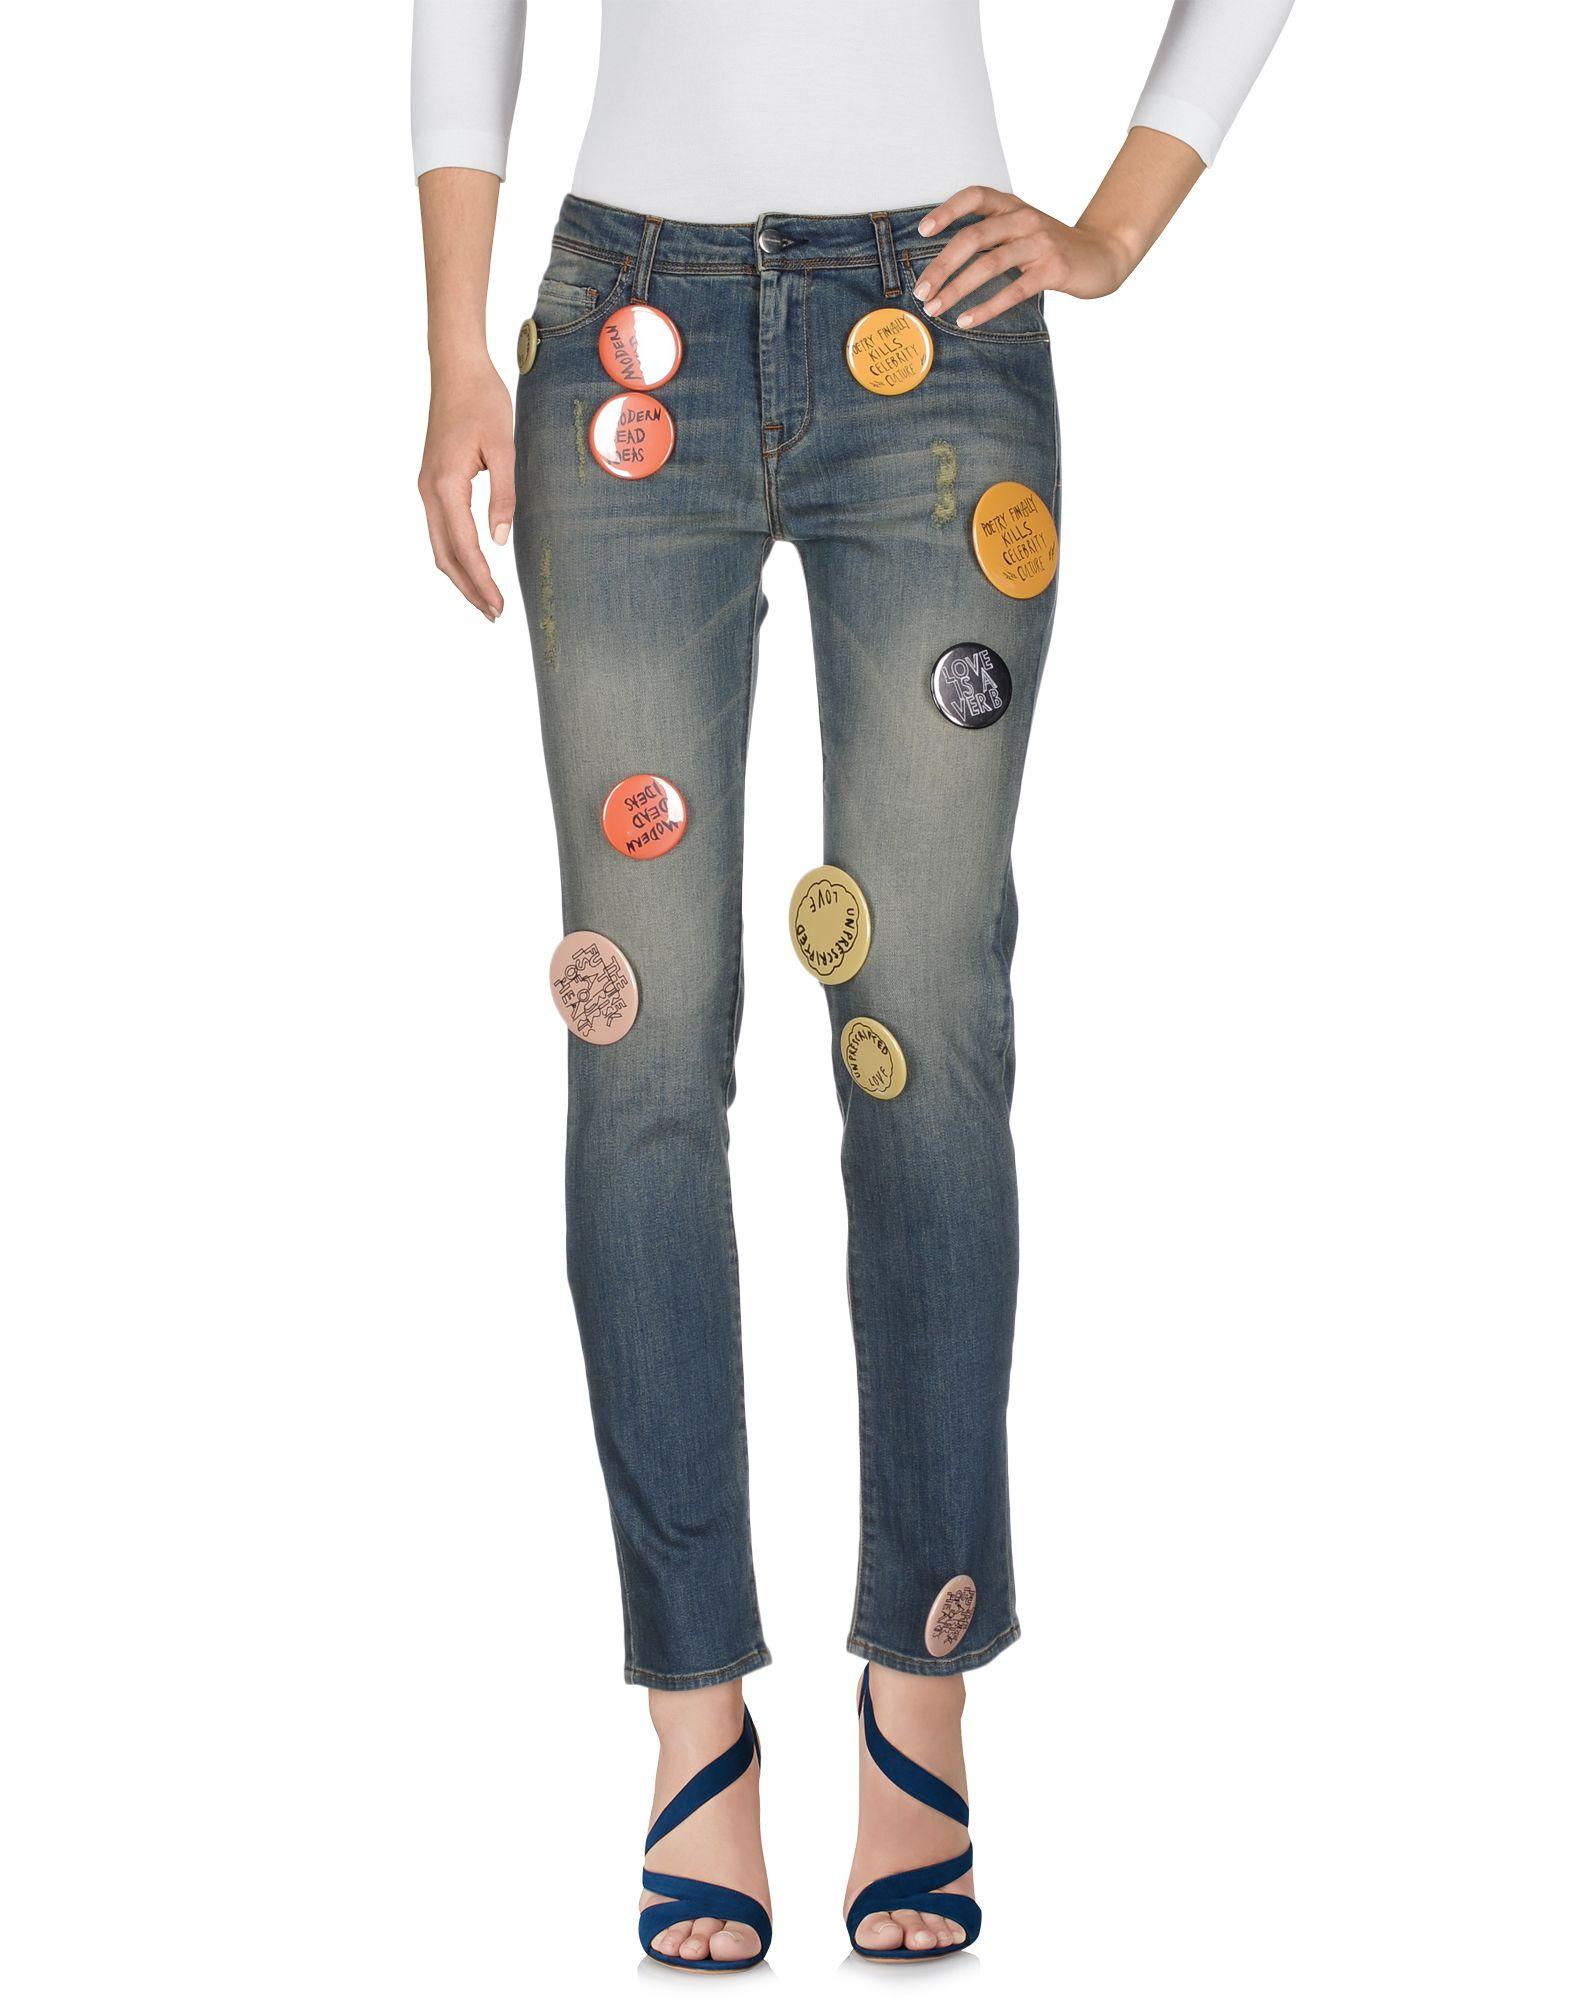 Фото - EACH X OTHER Джинсовые брюки брошь blucome bijouteria esmaltes 7106100495